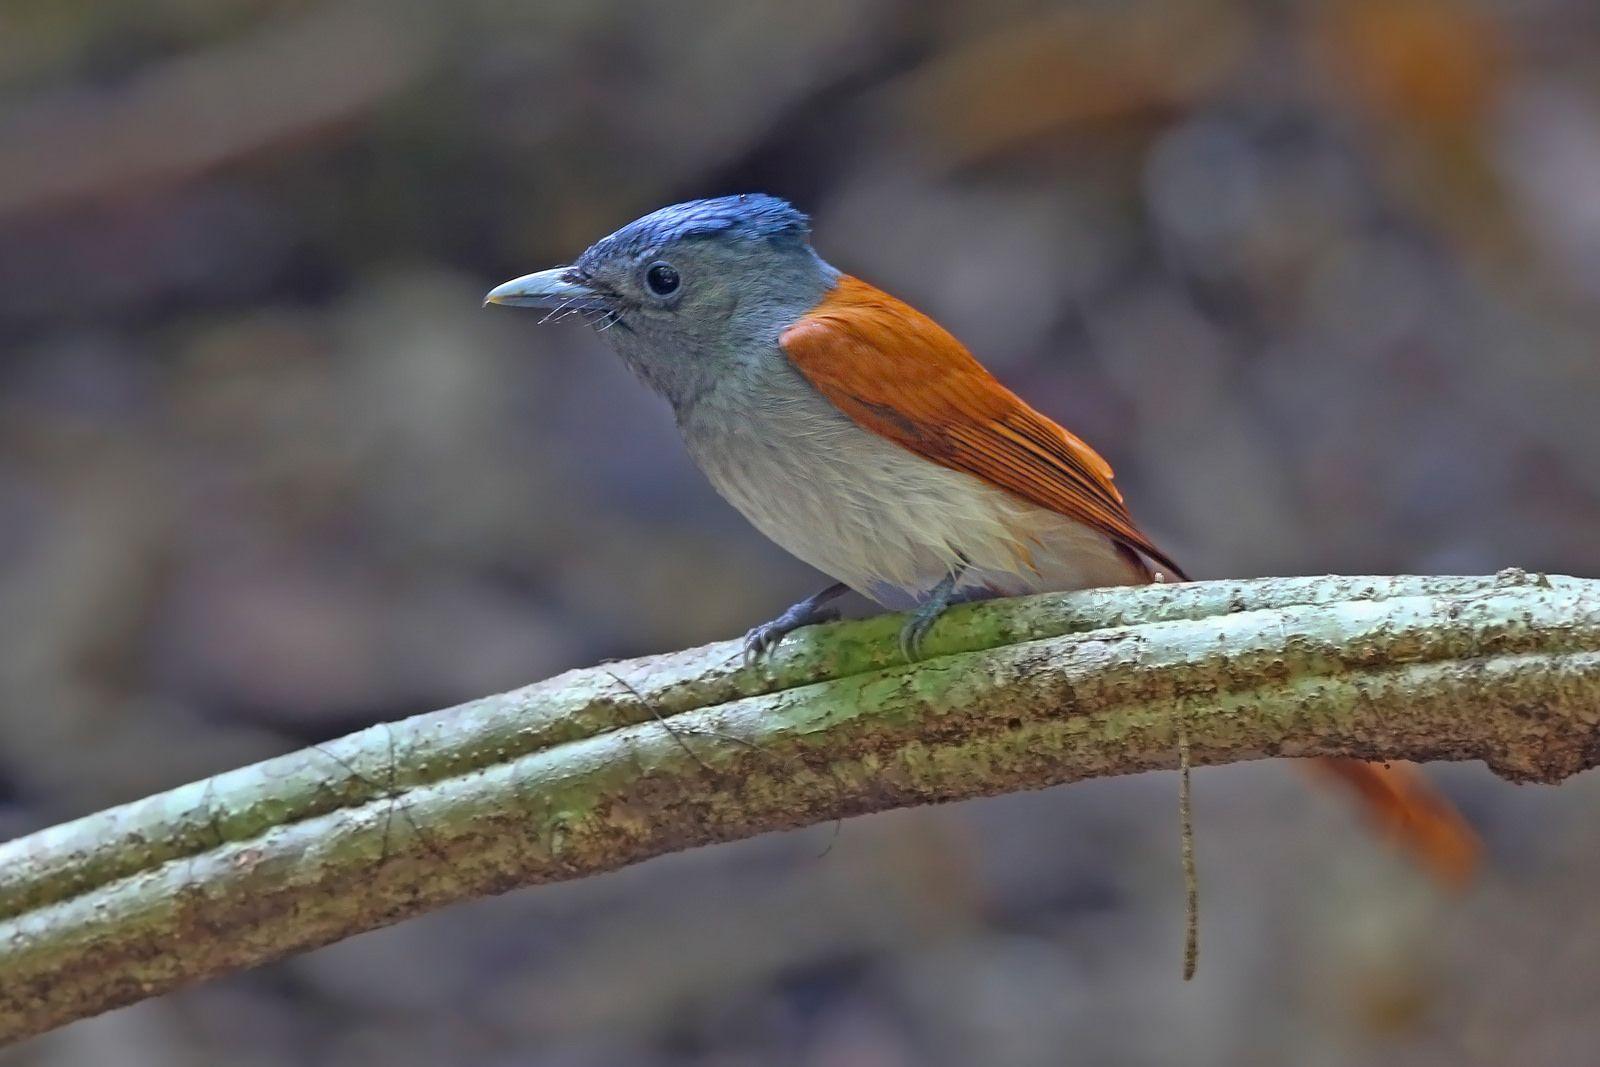 Asian Paradise Flycatcher (Terpsiphone paradisi) 寿带鸟